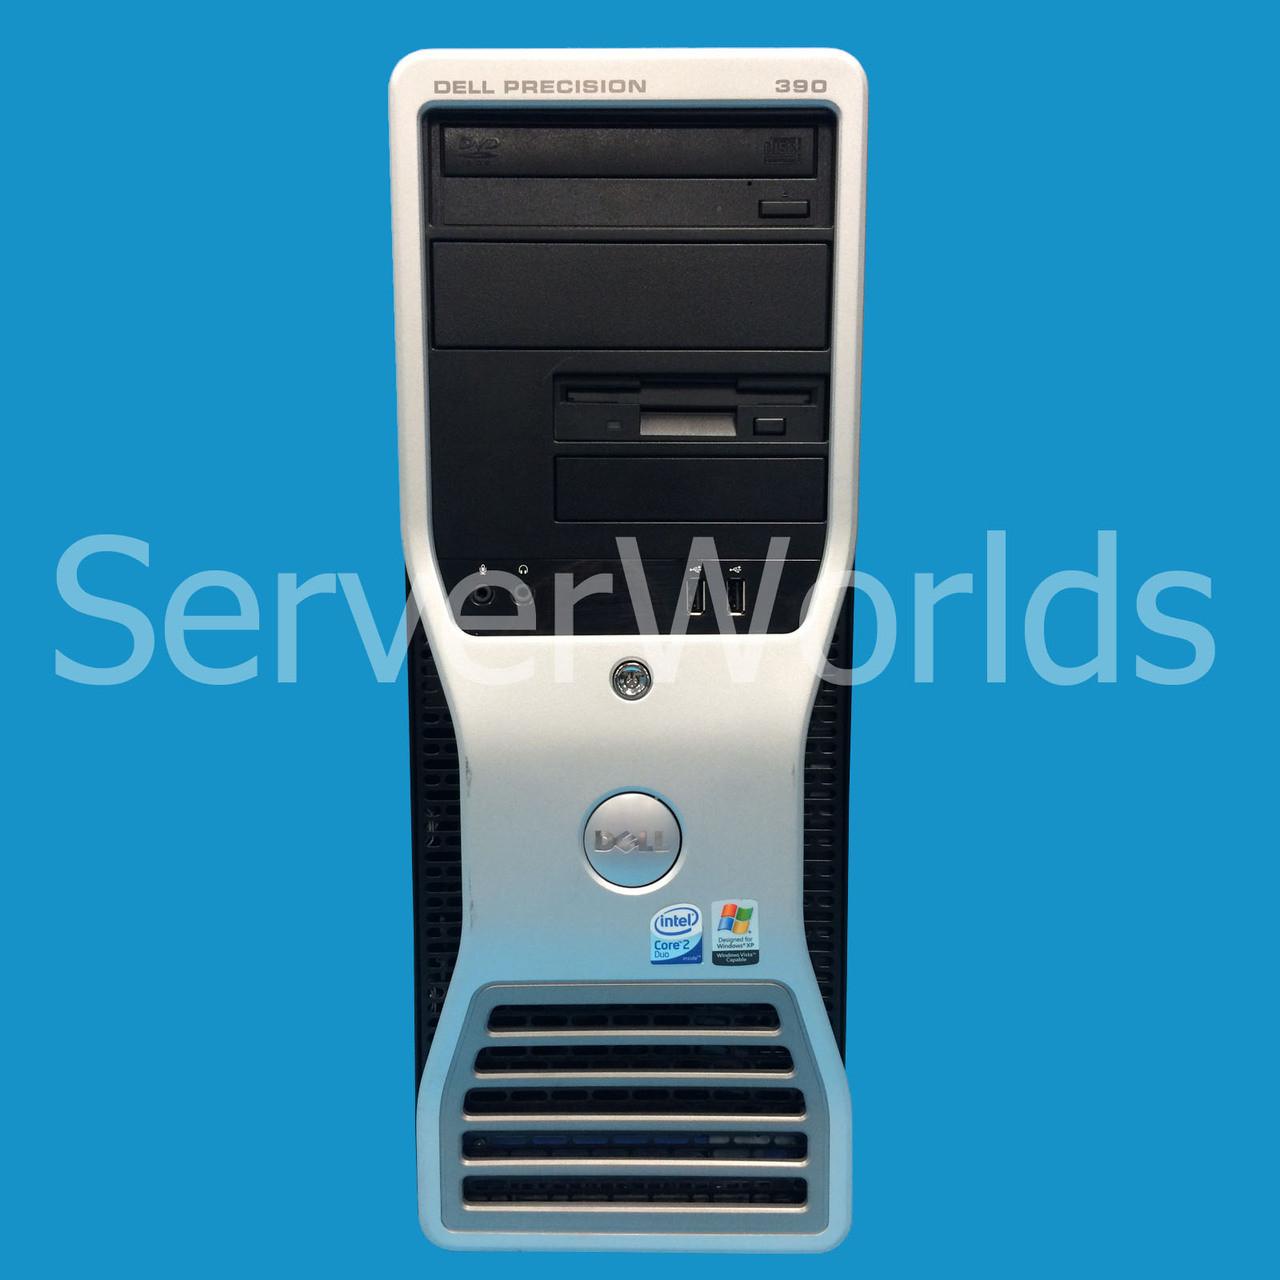 Dell Precision 390 Broadcom LAN Windows 8 X64